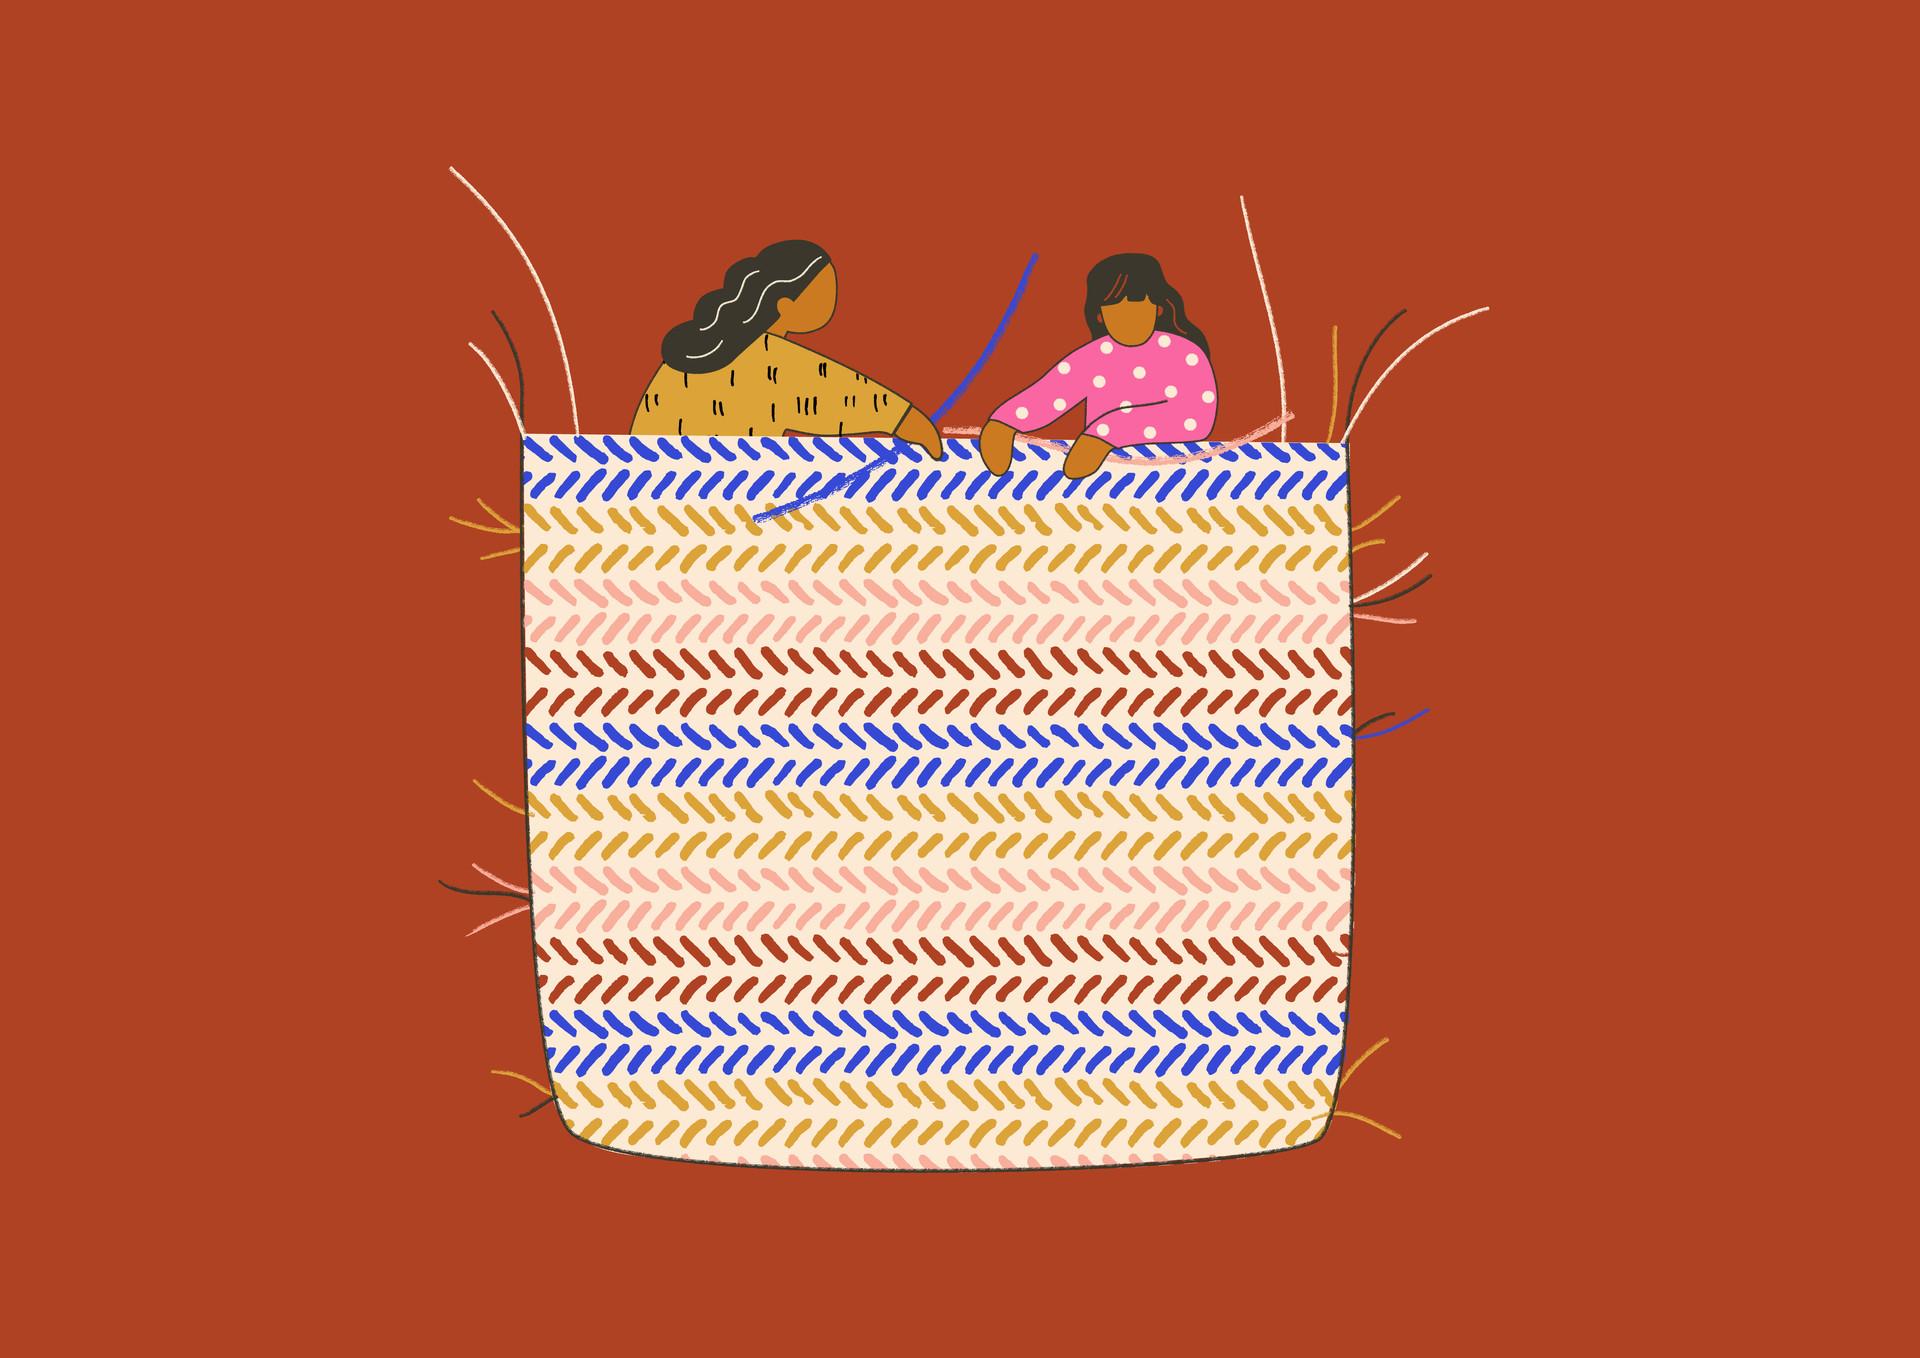 Final_Indigenous Basket Weaving-01.jpg